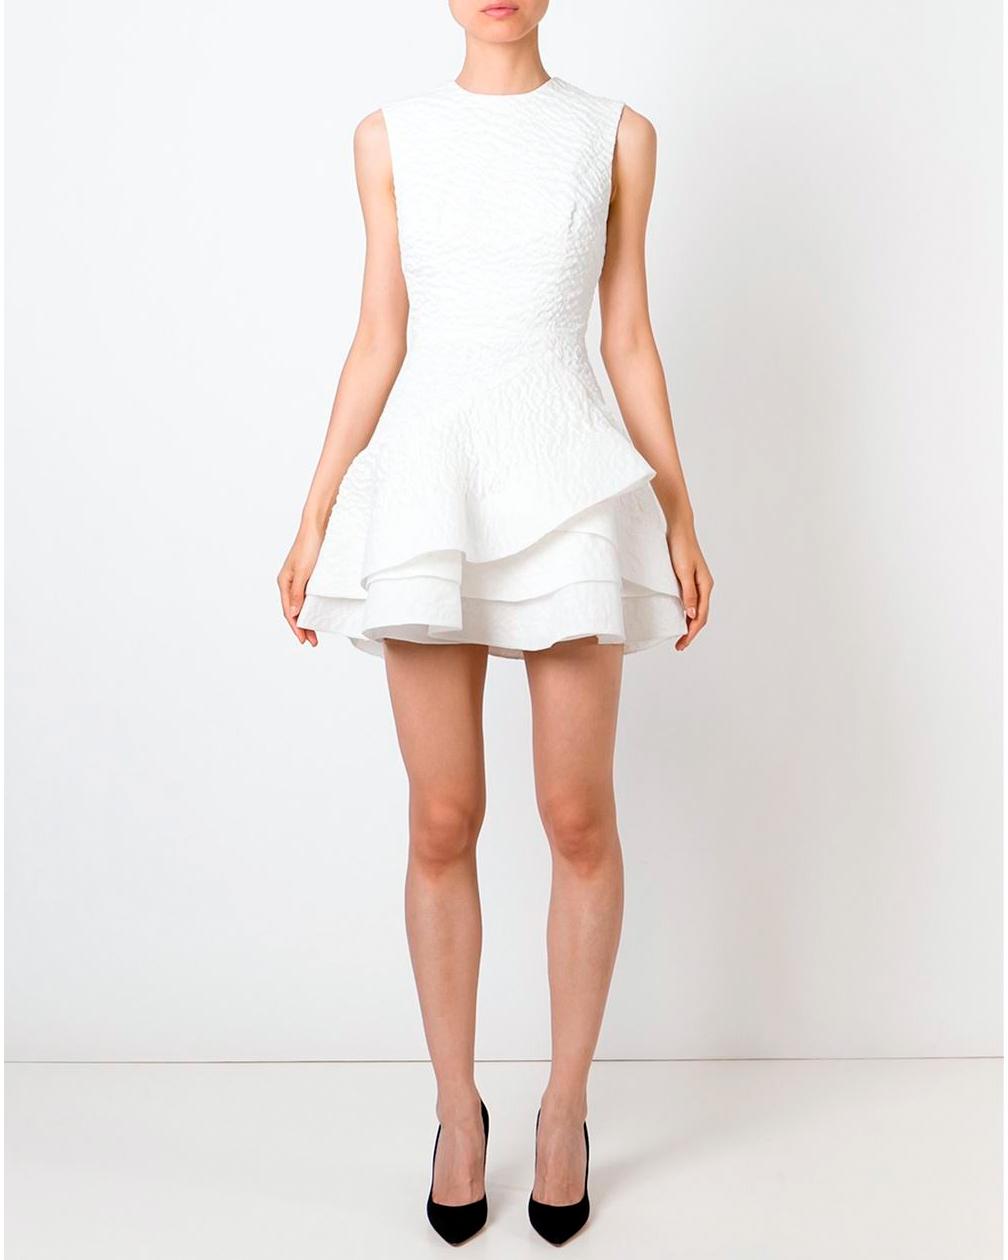 little-white-dress-alex-perry-farfetch-1495-1115.jpg